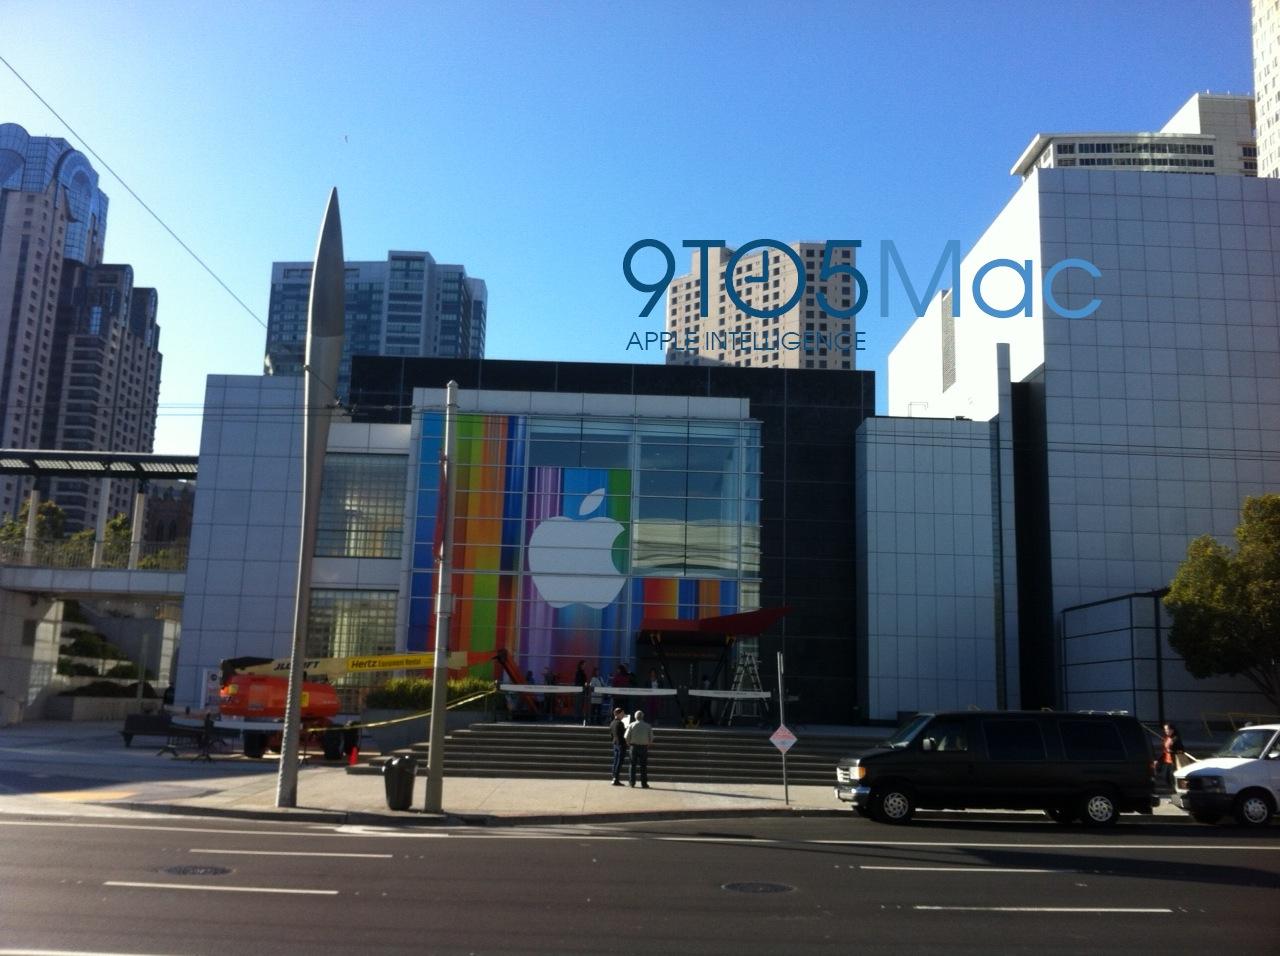 Yerba Buena Center quase pronto pro evento da Apple